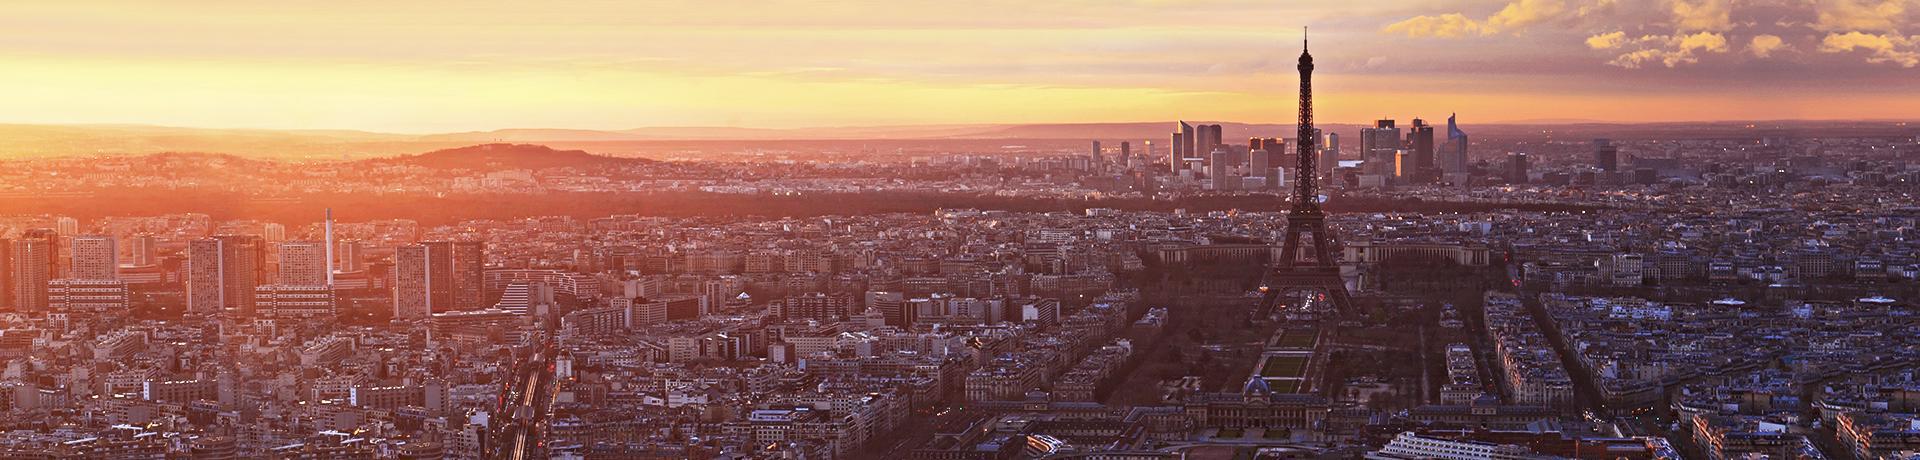 city-id-3482-frankreich-paris-umgebung-paris_TS_166463889_F1920x460.jpg